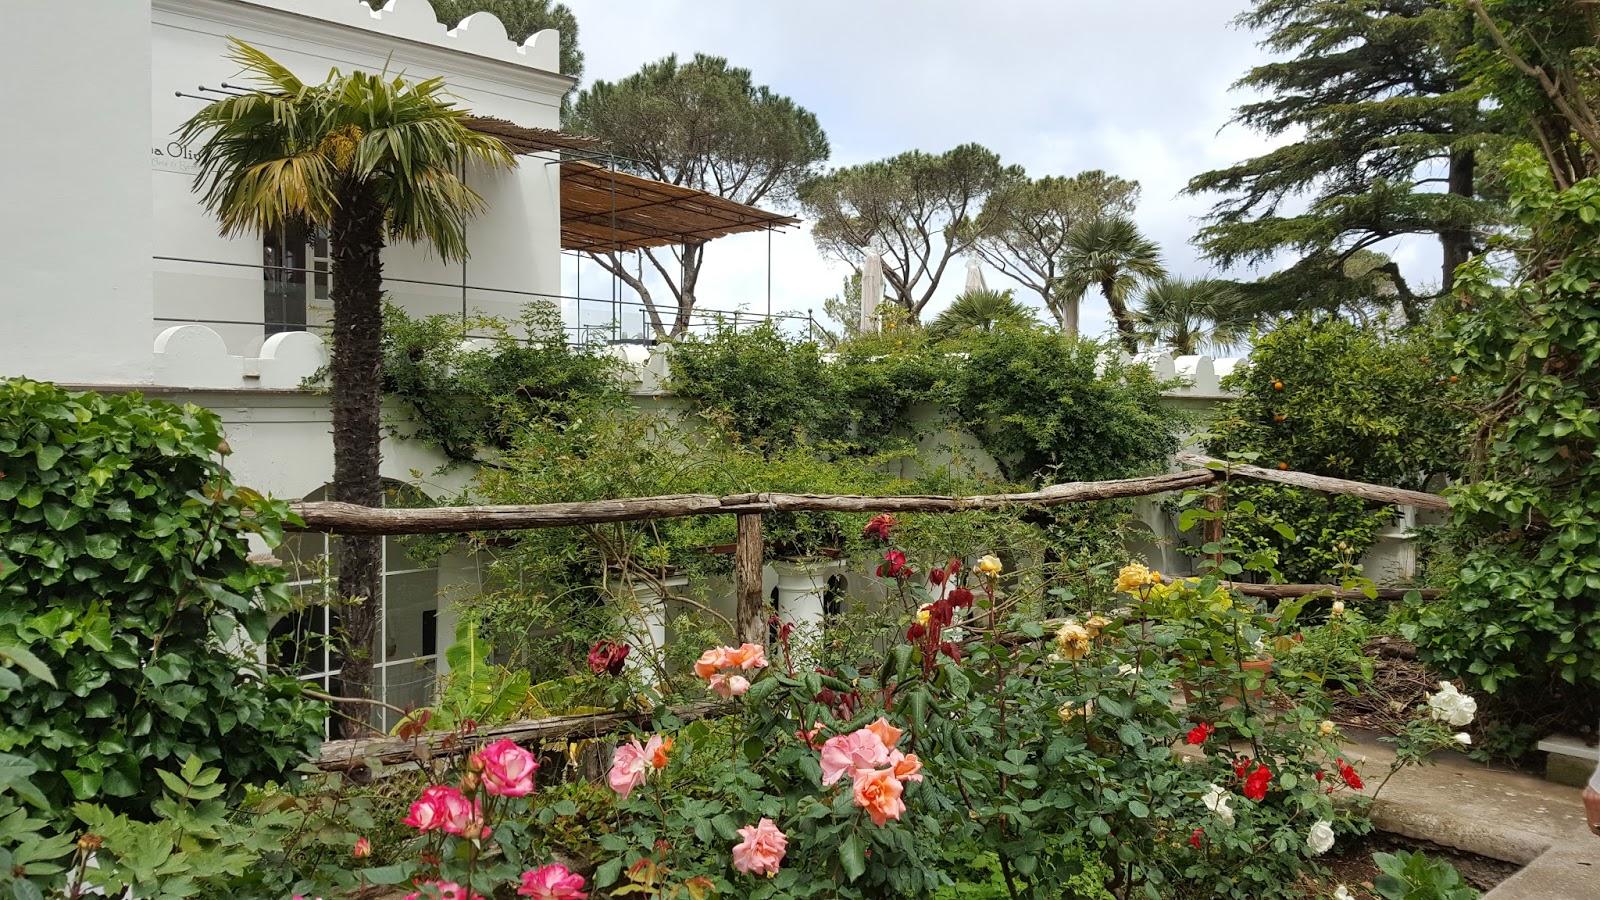 hortibus voyage picards palais et jardins prives de naples. Black Bedroom Furniture Sets. Home Design Ideas